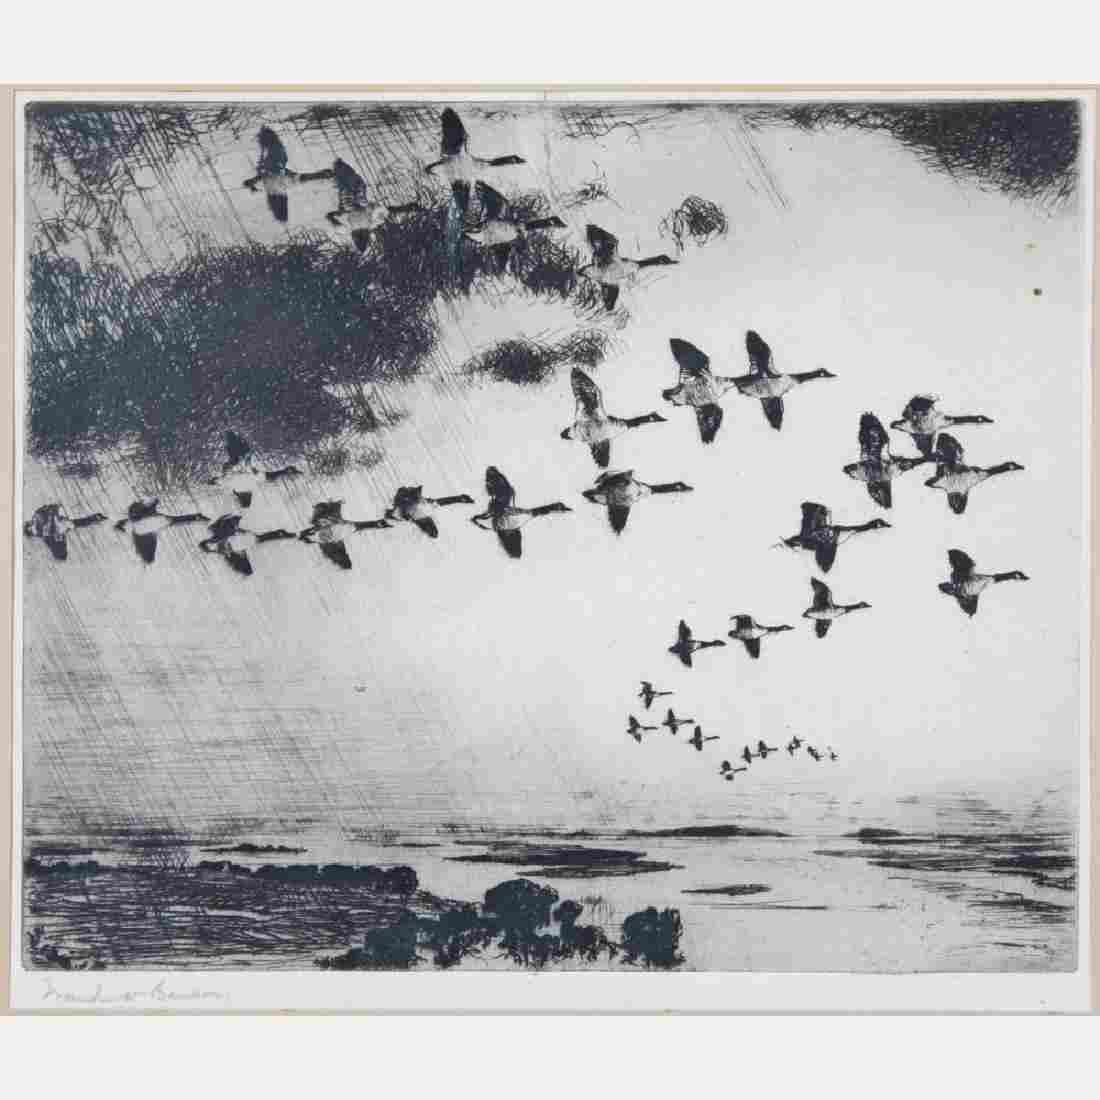 Frank Weston Benson (1862-1951) The Long Journey,